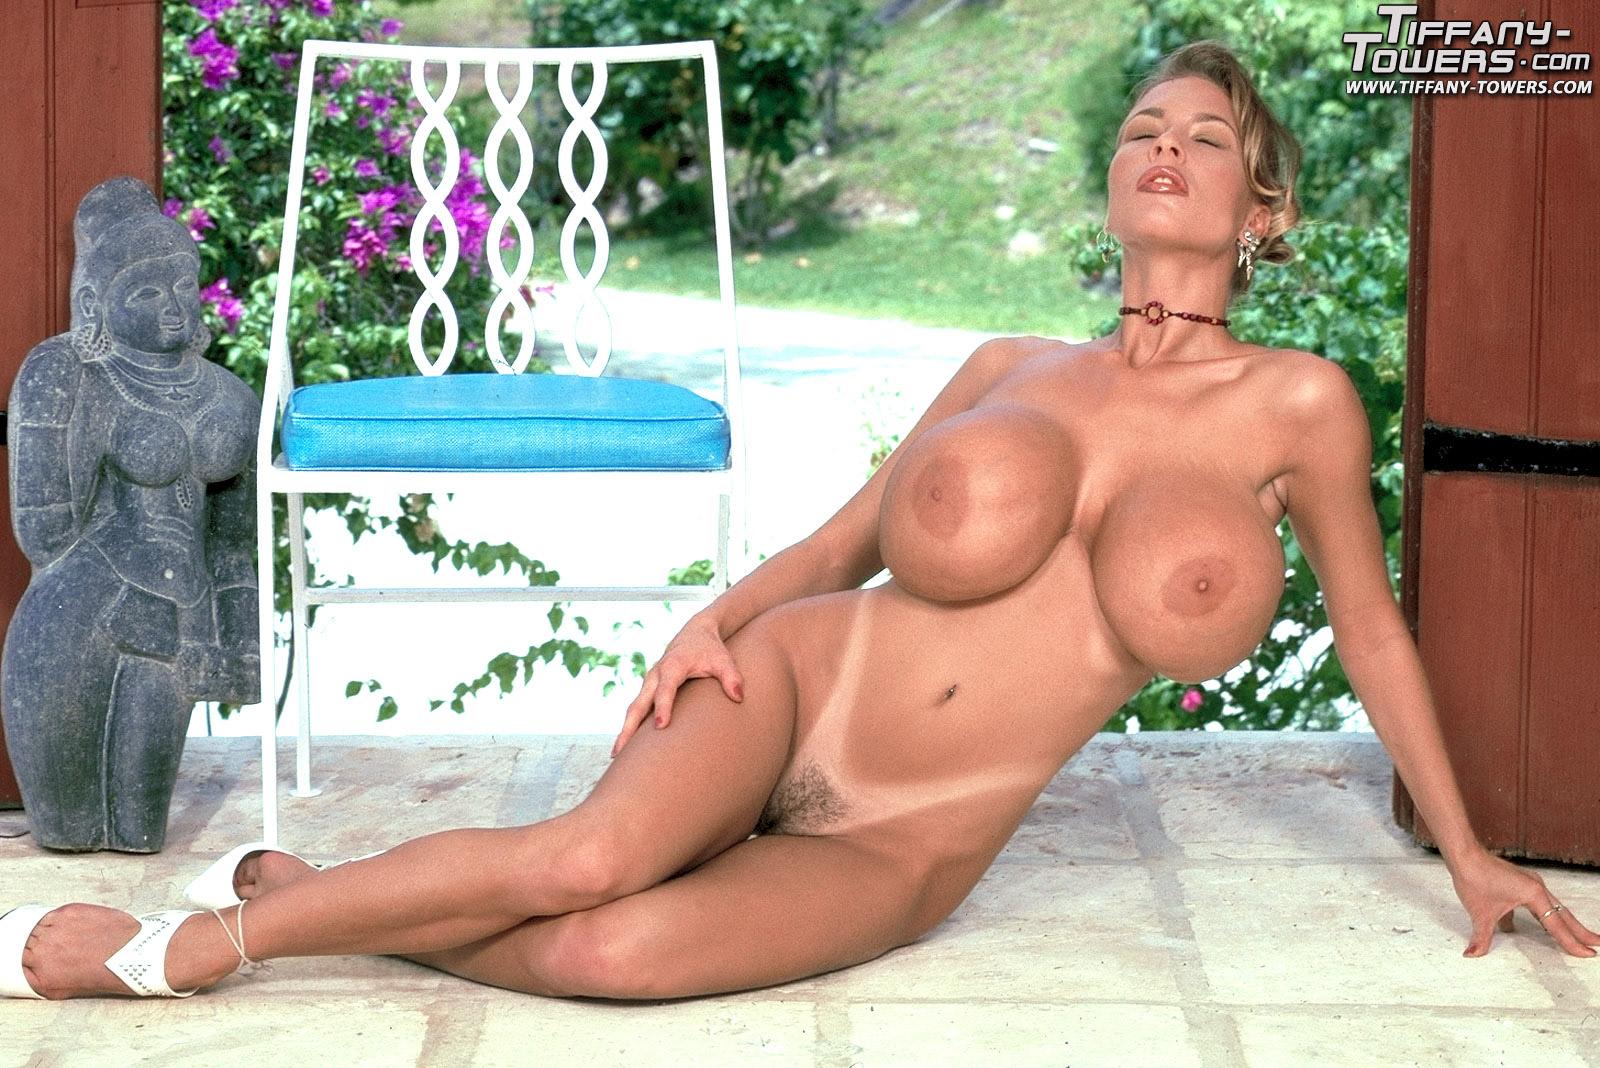 Tiffany jones big tits